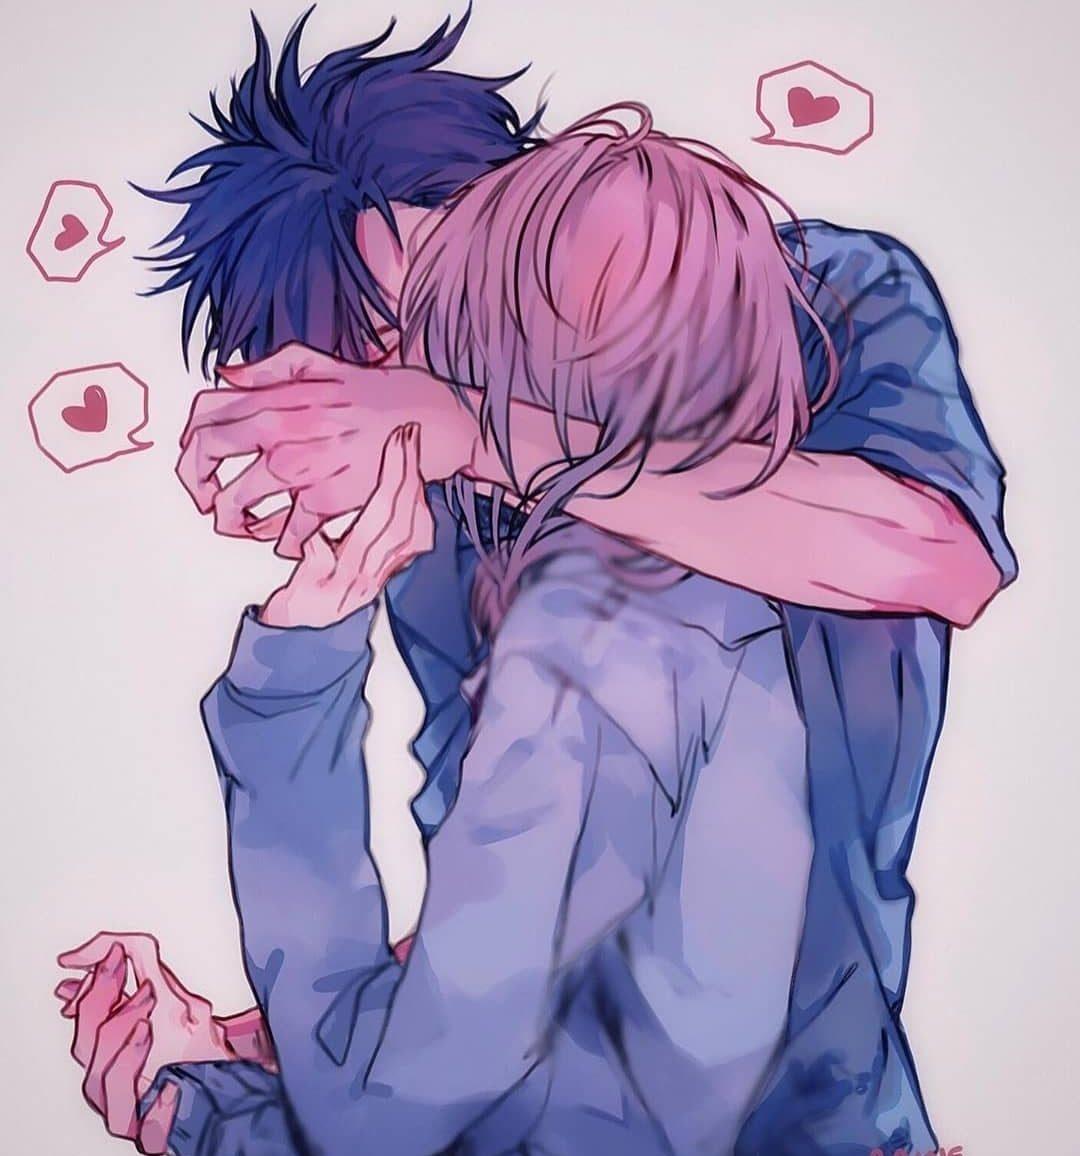 Love Couple Anime Drawings